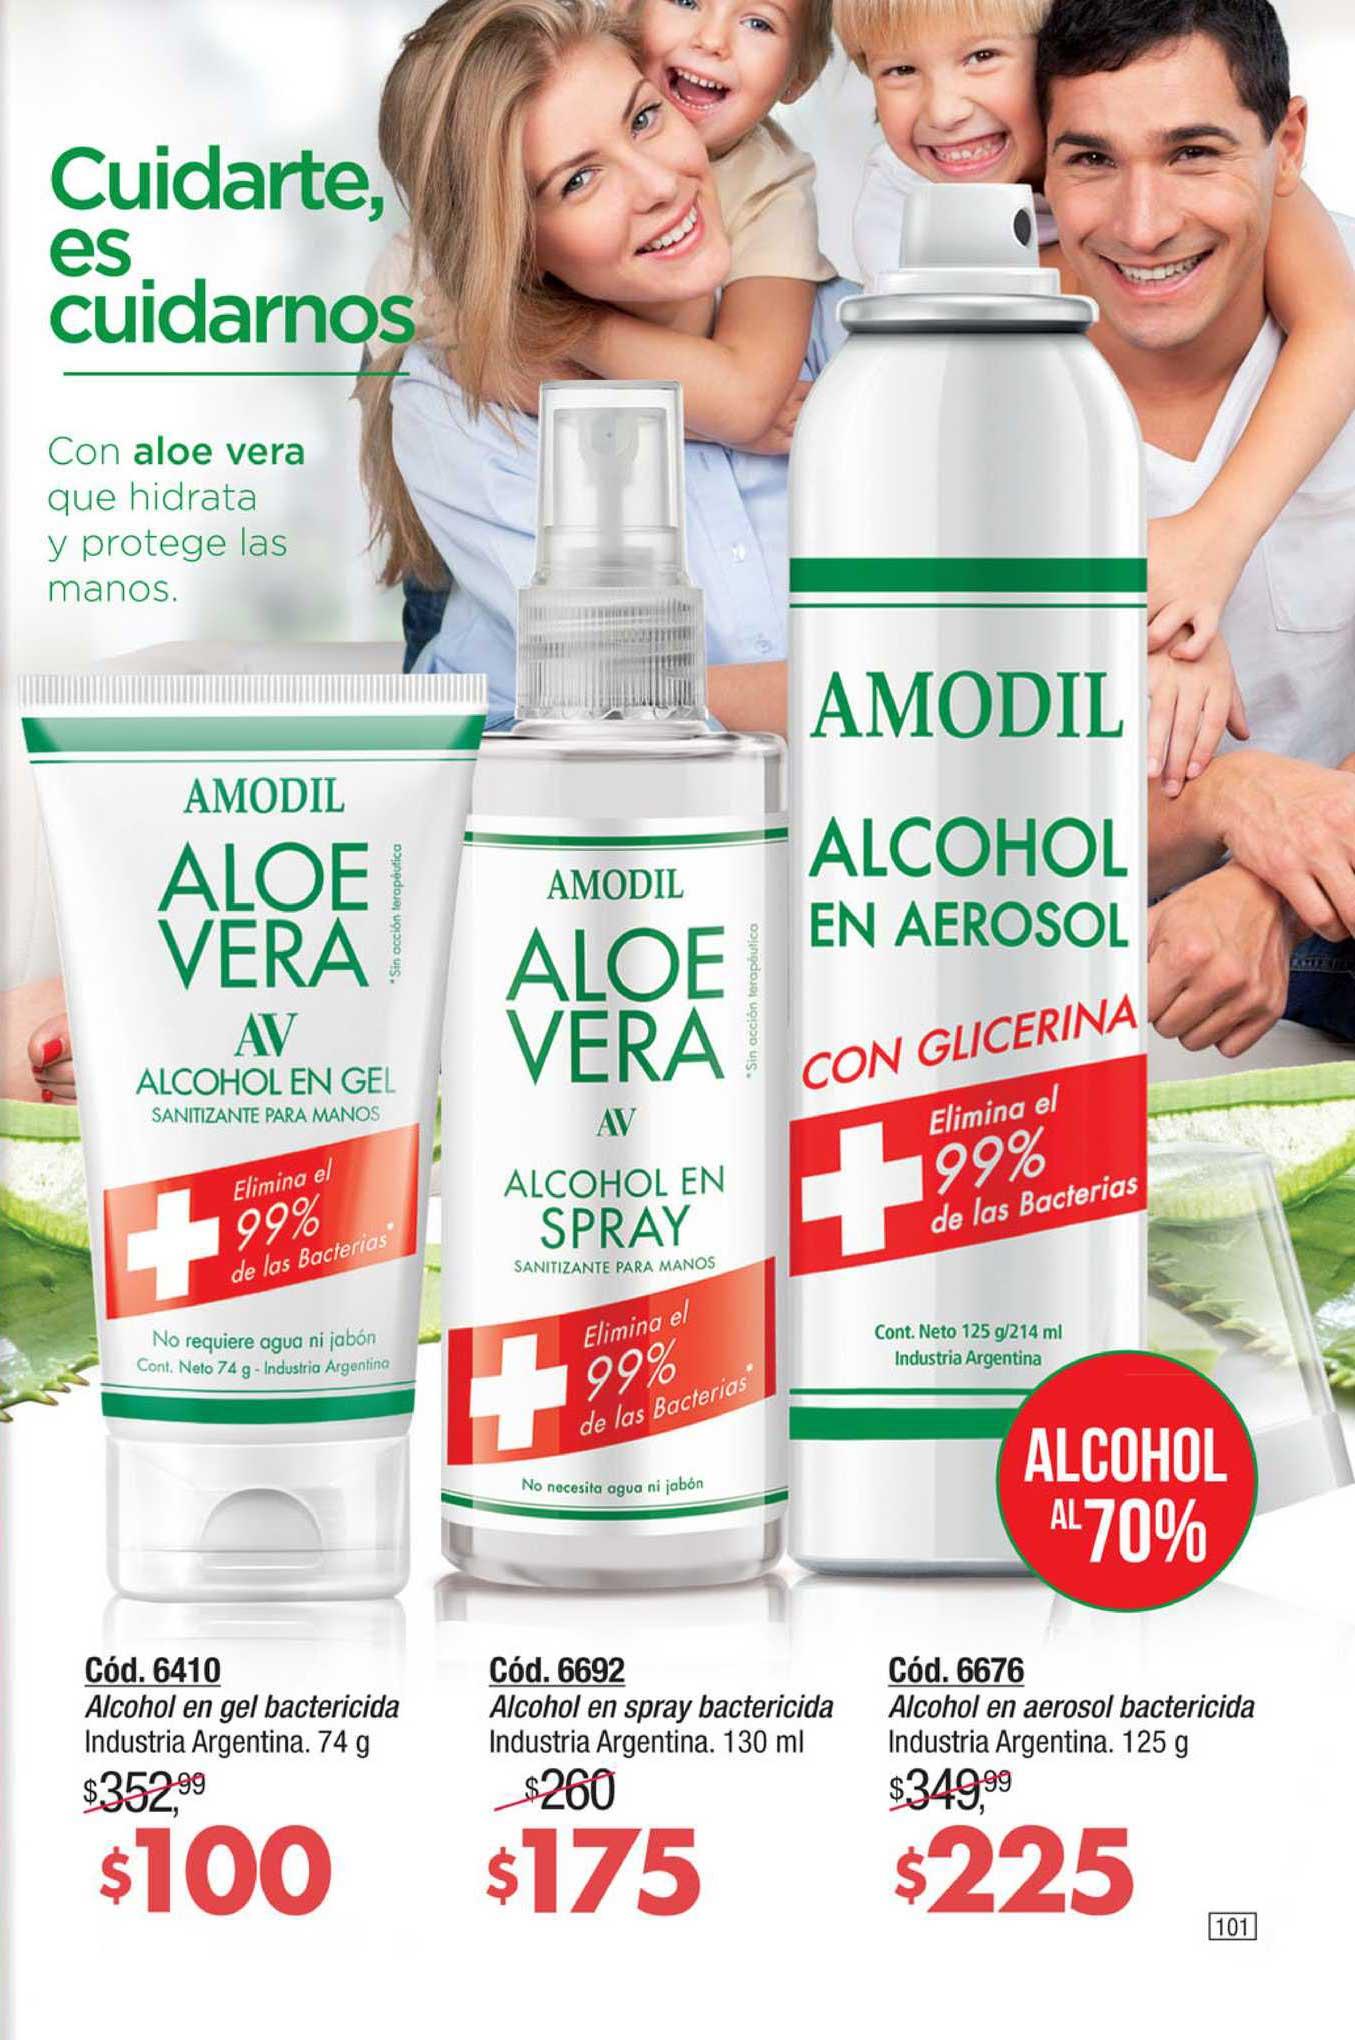 Amodil Alcohol En Gel Bactericida Alcohol En Spray Bactericida Alcohol En Aresol Bactericida